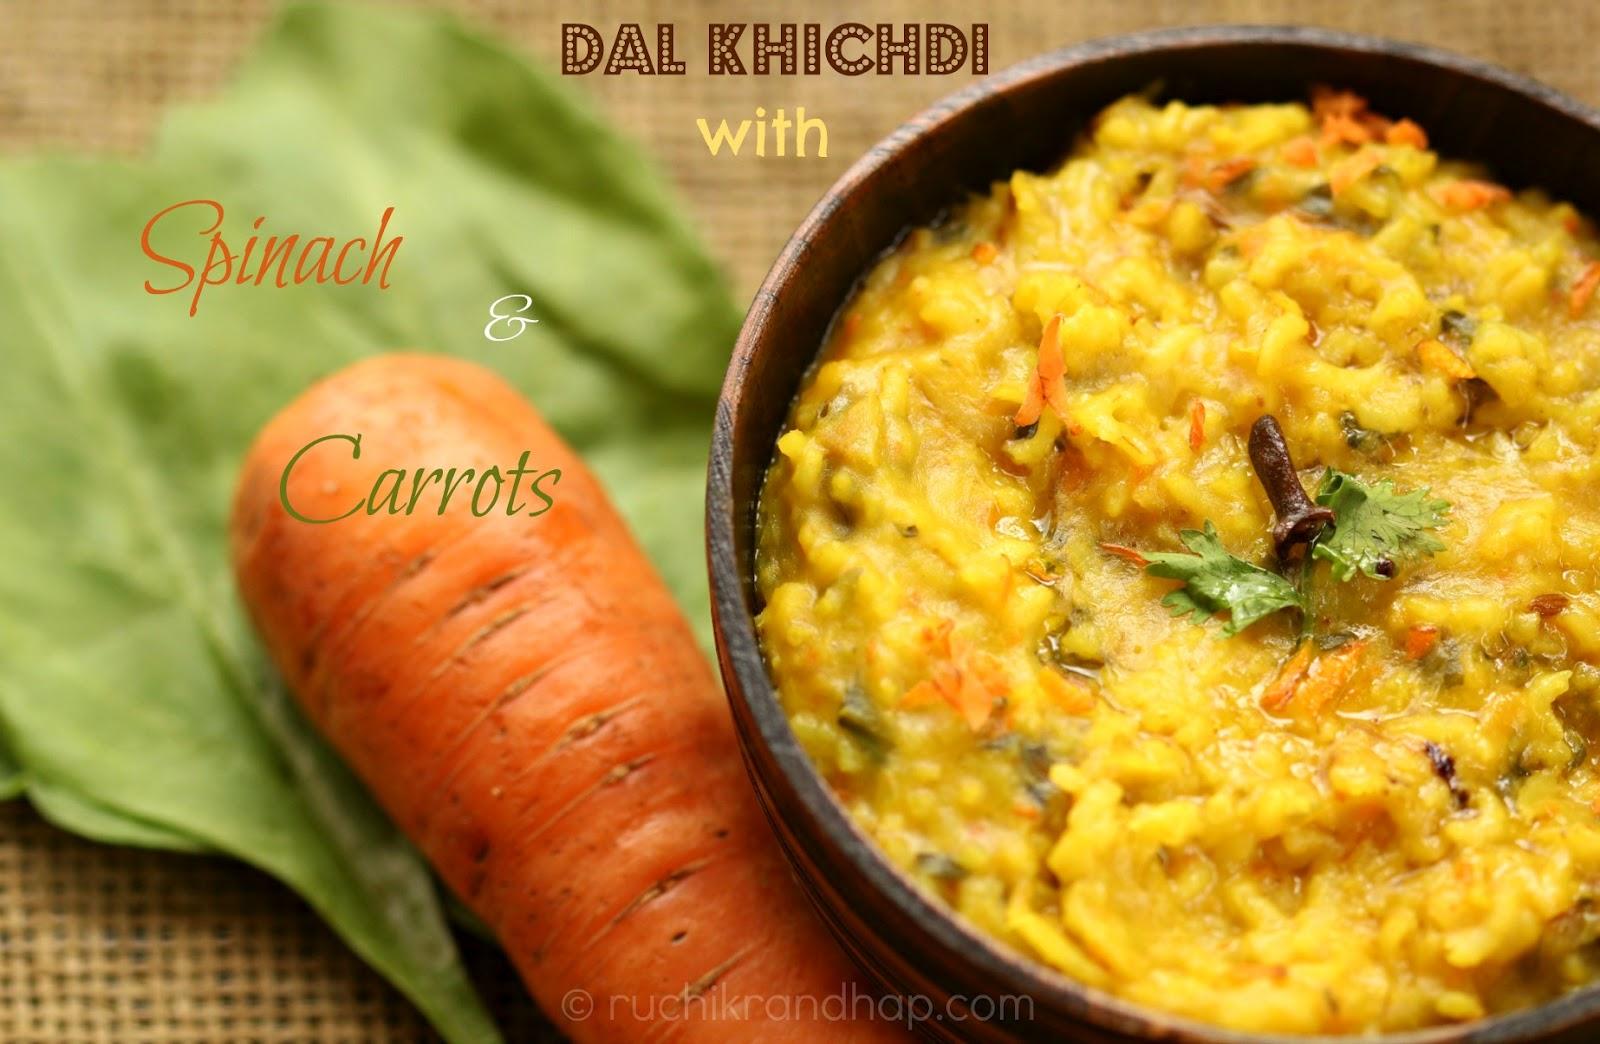 Dal khichdi lentil porridge with spinach carrots a complete dal khichdi lentil porridge with spinach carrots a complete meal ccuart Choice Image